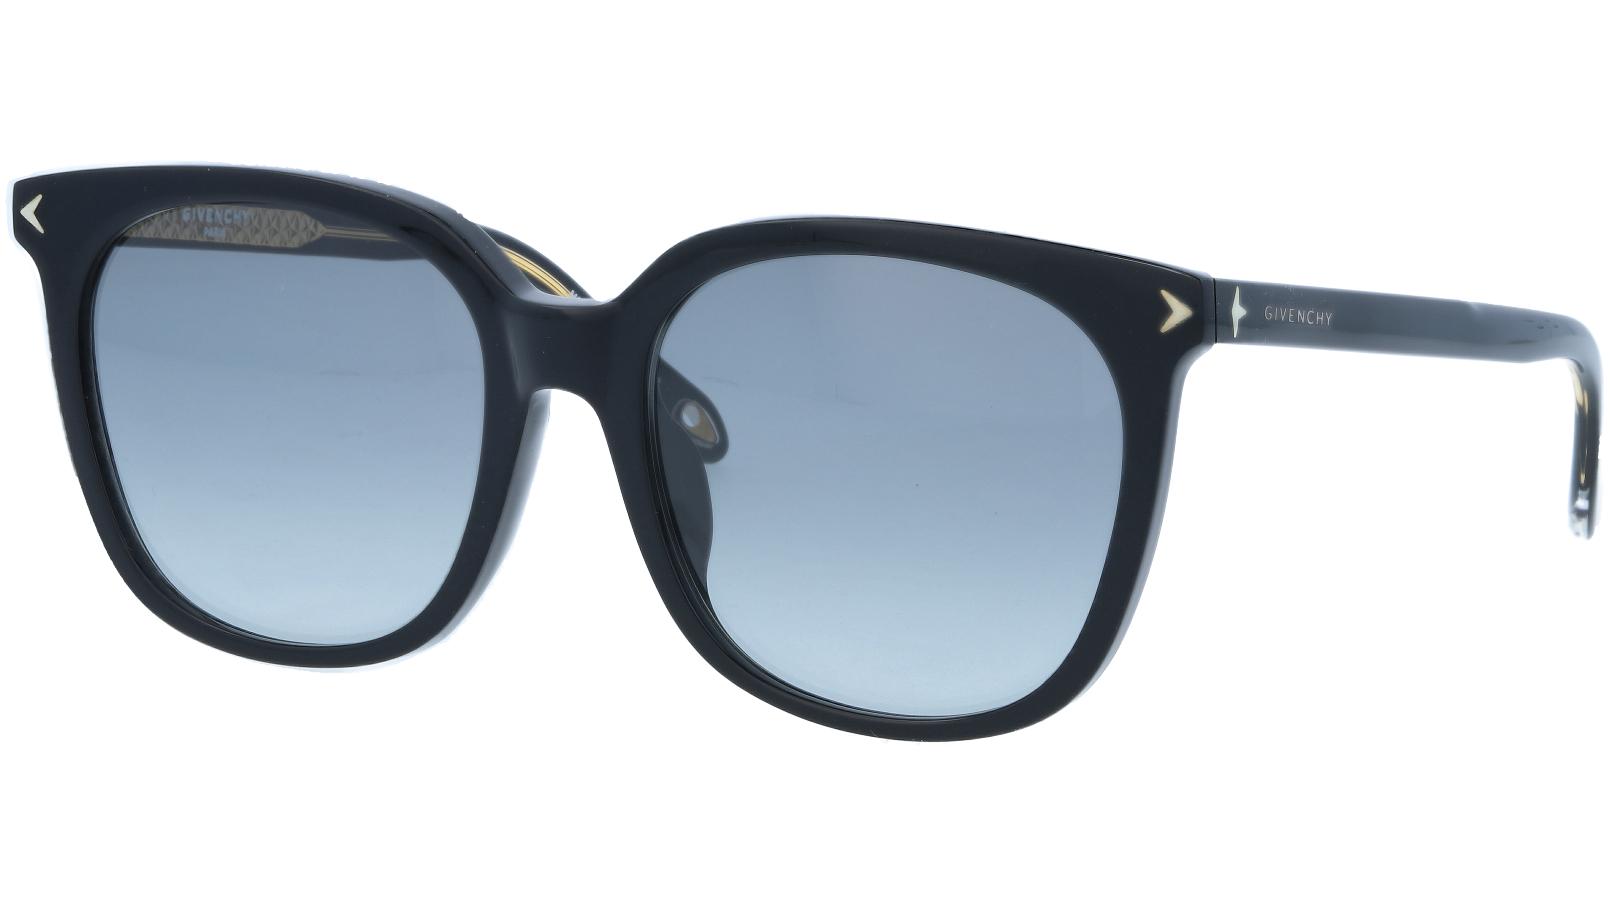 Givenchy GV7085FS 80790 56 Black Sunglasses